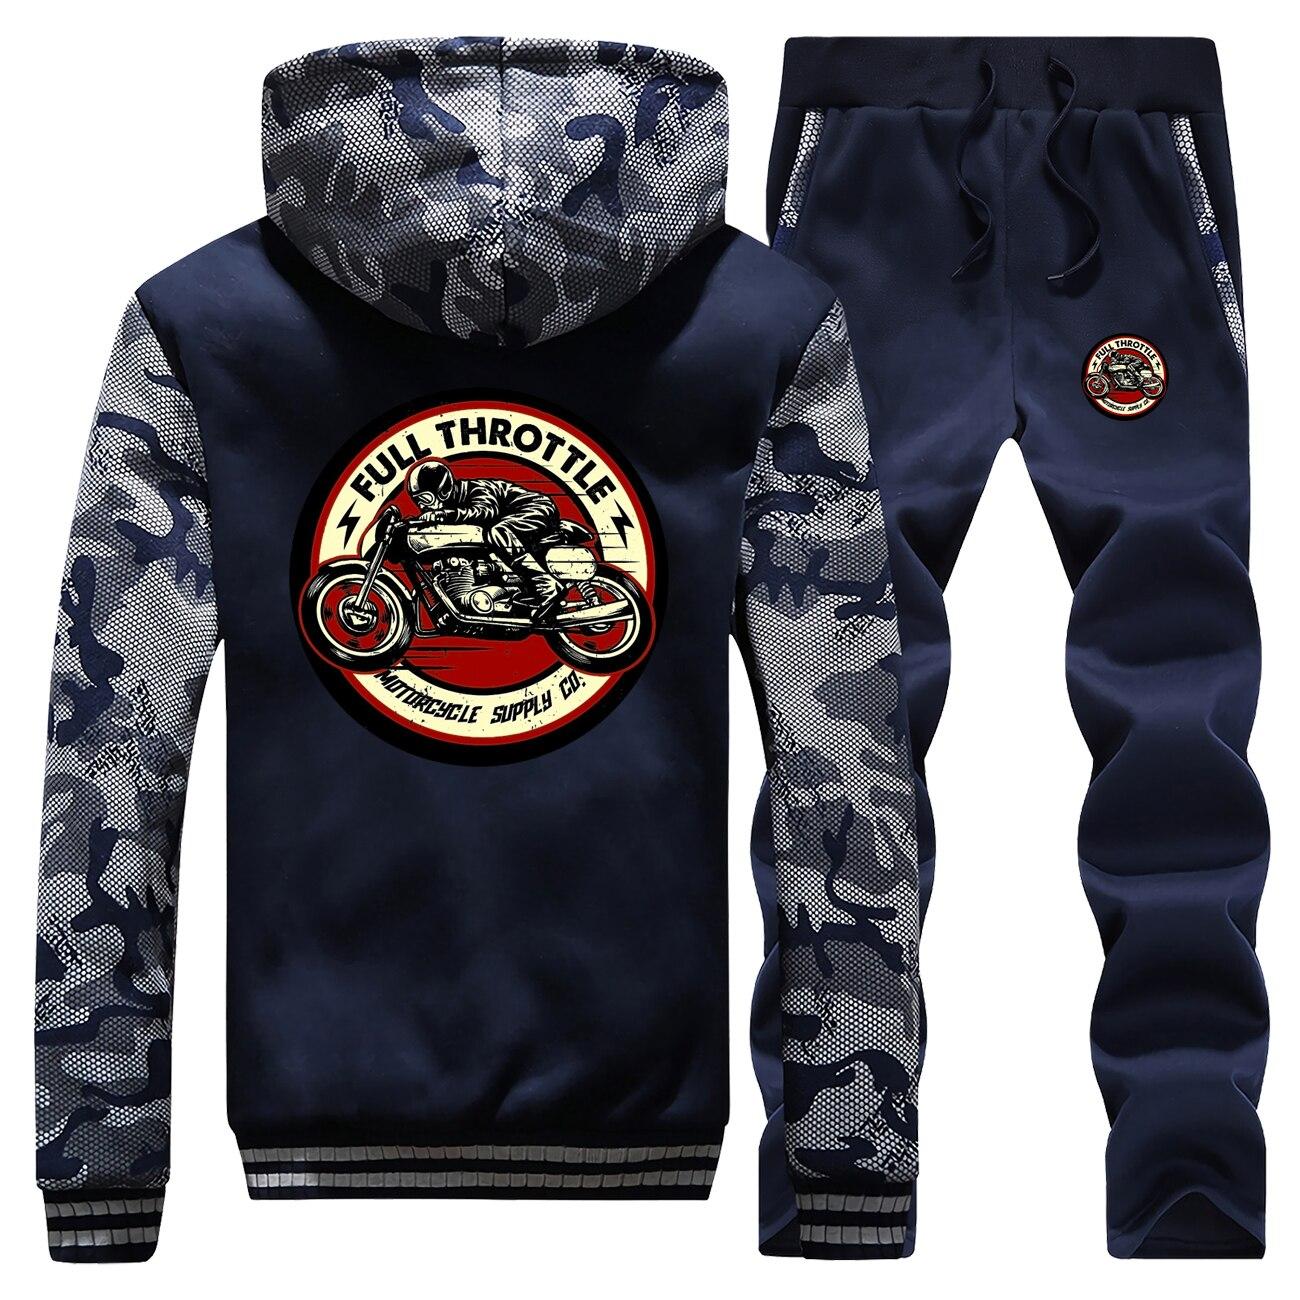 Winter Men Thick Sweatshirt+Pants 2 Piece Sets Full Throttle Cafe Racer Rockabilly Biker Jacket Fleece Warm Suit Mens Hoodies